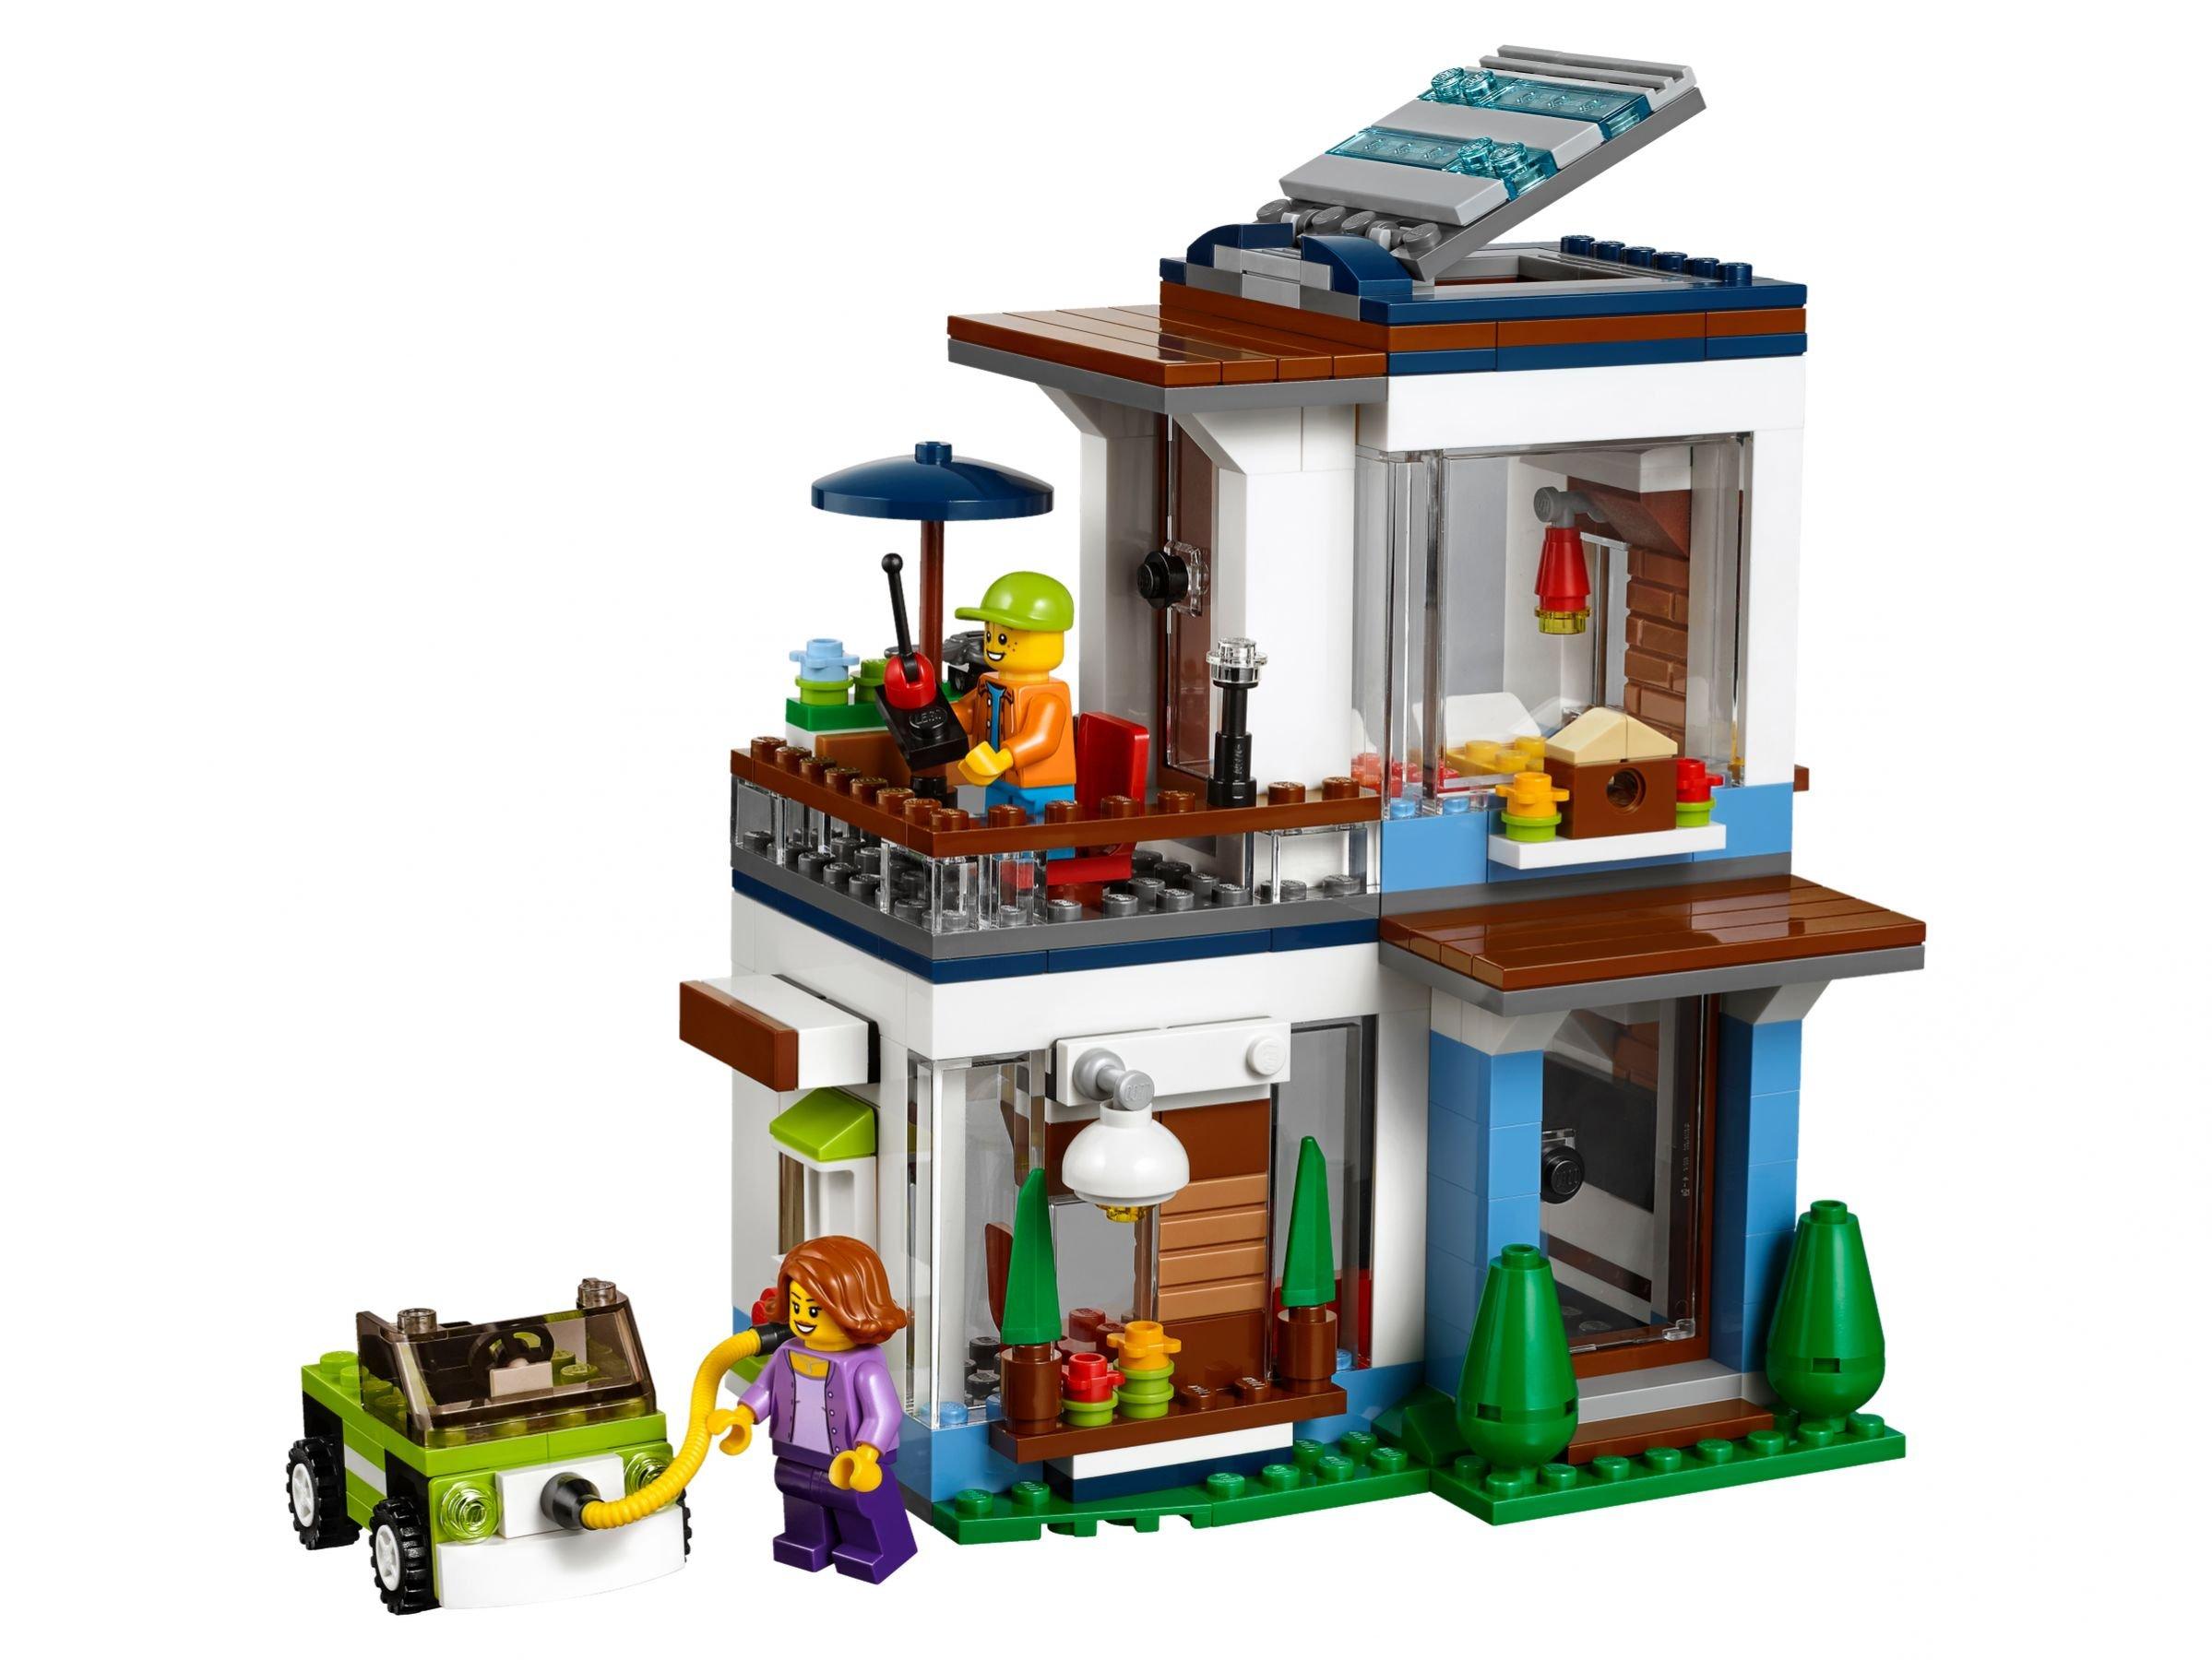 Lego 31068 modernes zuhause creator 2017 ab 26 99 for Modernes lego haus